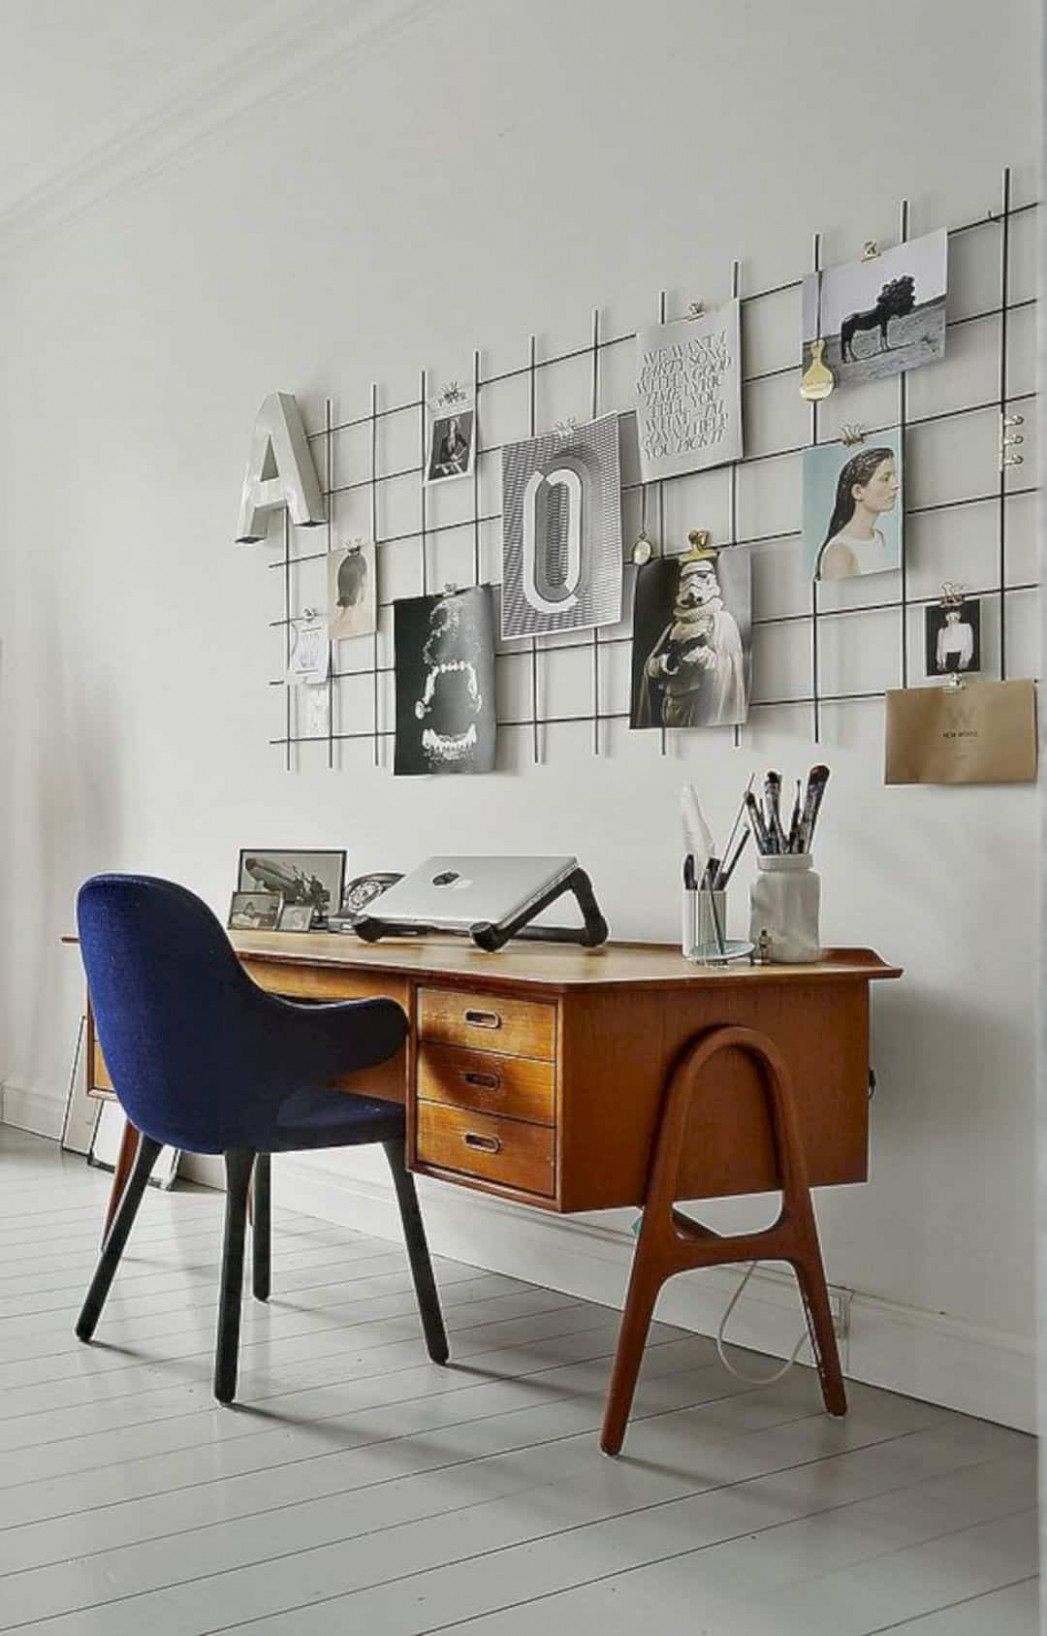 10 Office Wall Decoration Ideas - Wall Decor Ideas Office